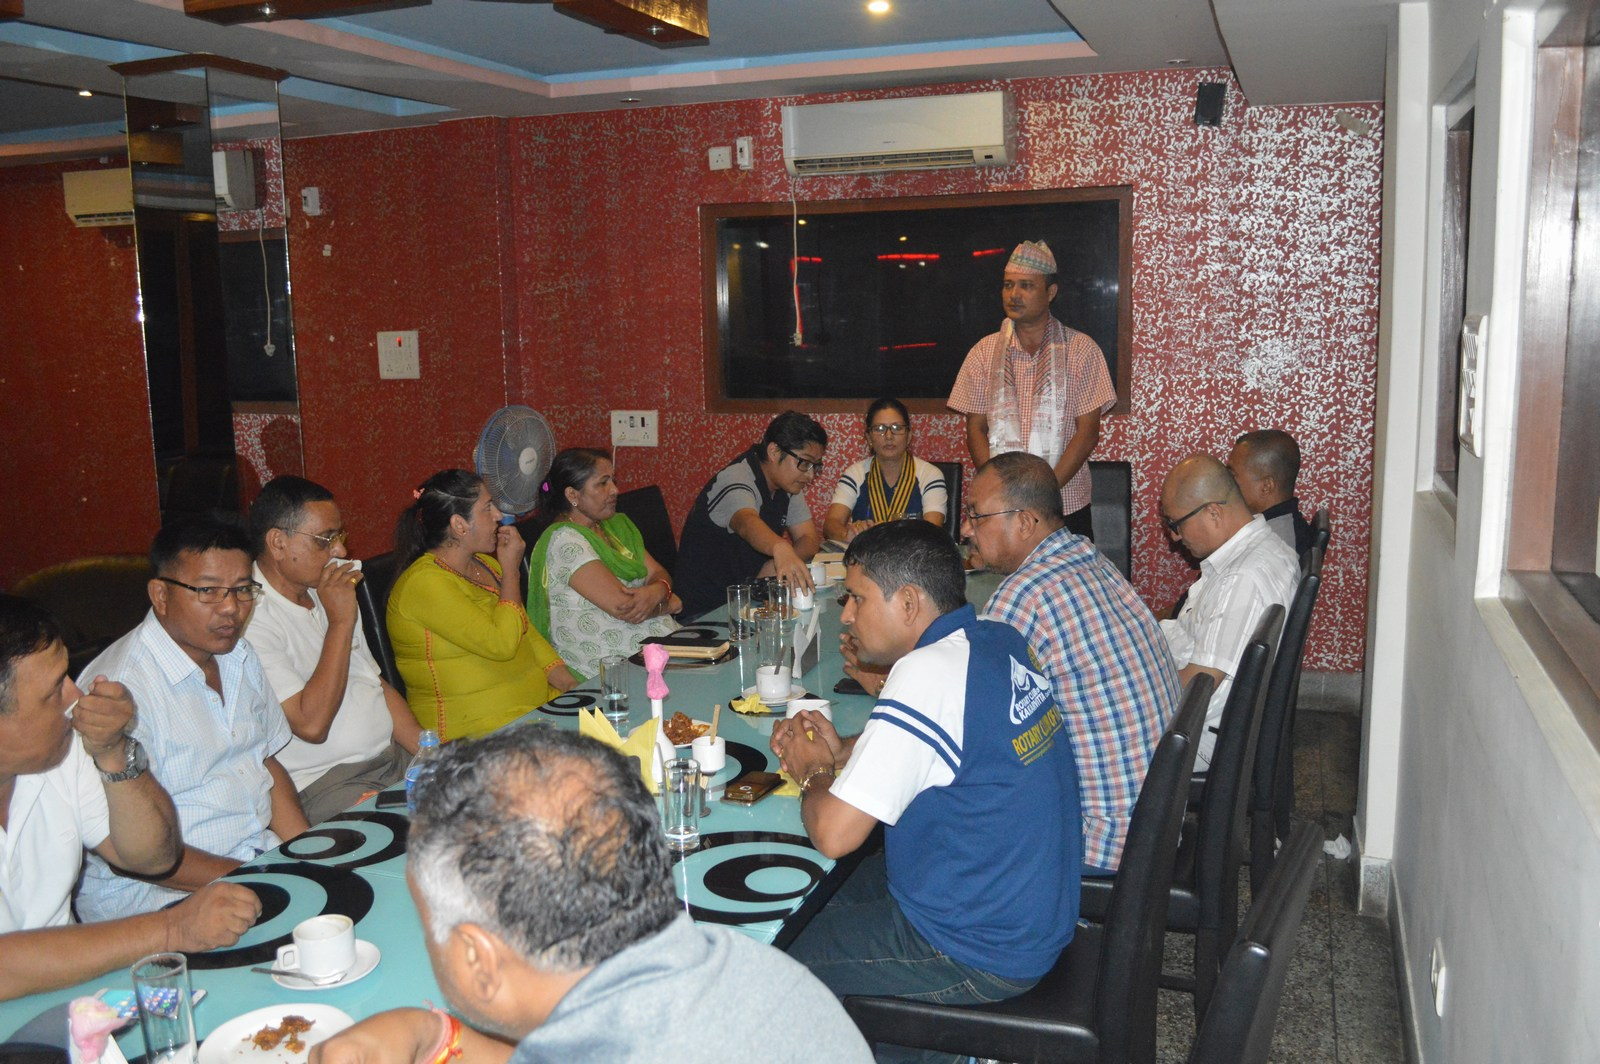 Weekly-Meeting-with-the-Guest-Speaker-DSP-Durga-Raj-Regmi-Rotary-Club-of-Kakarvitta-11